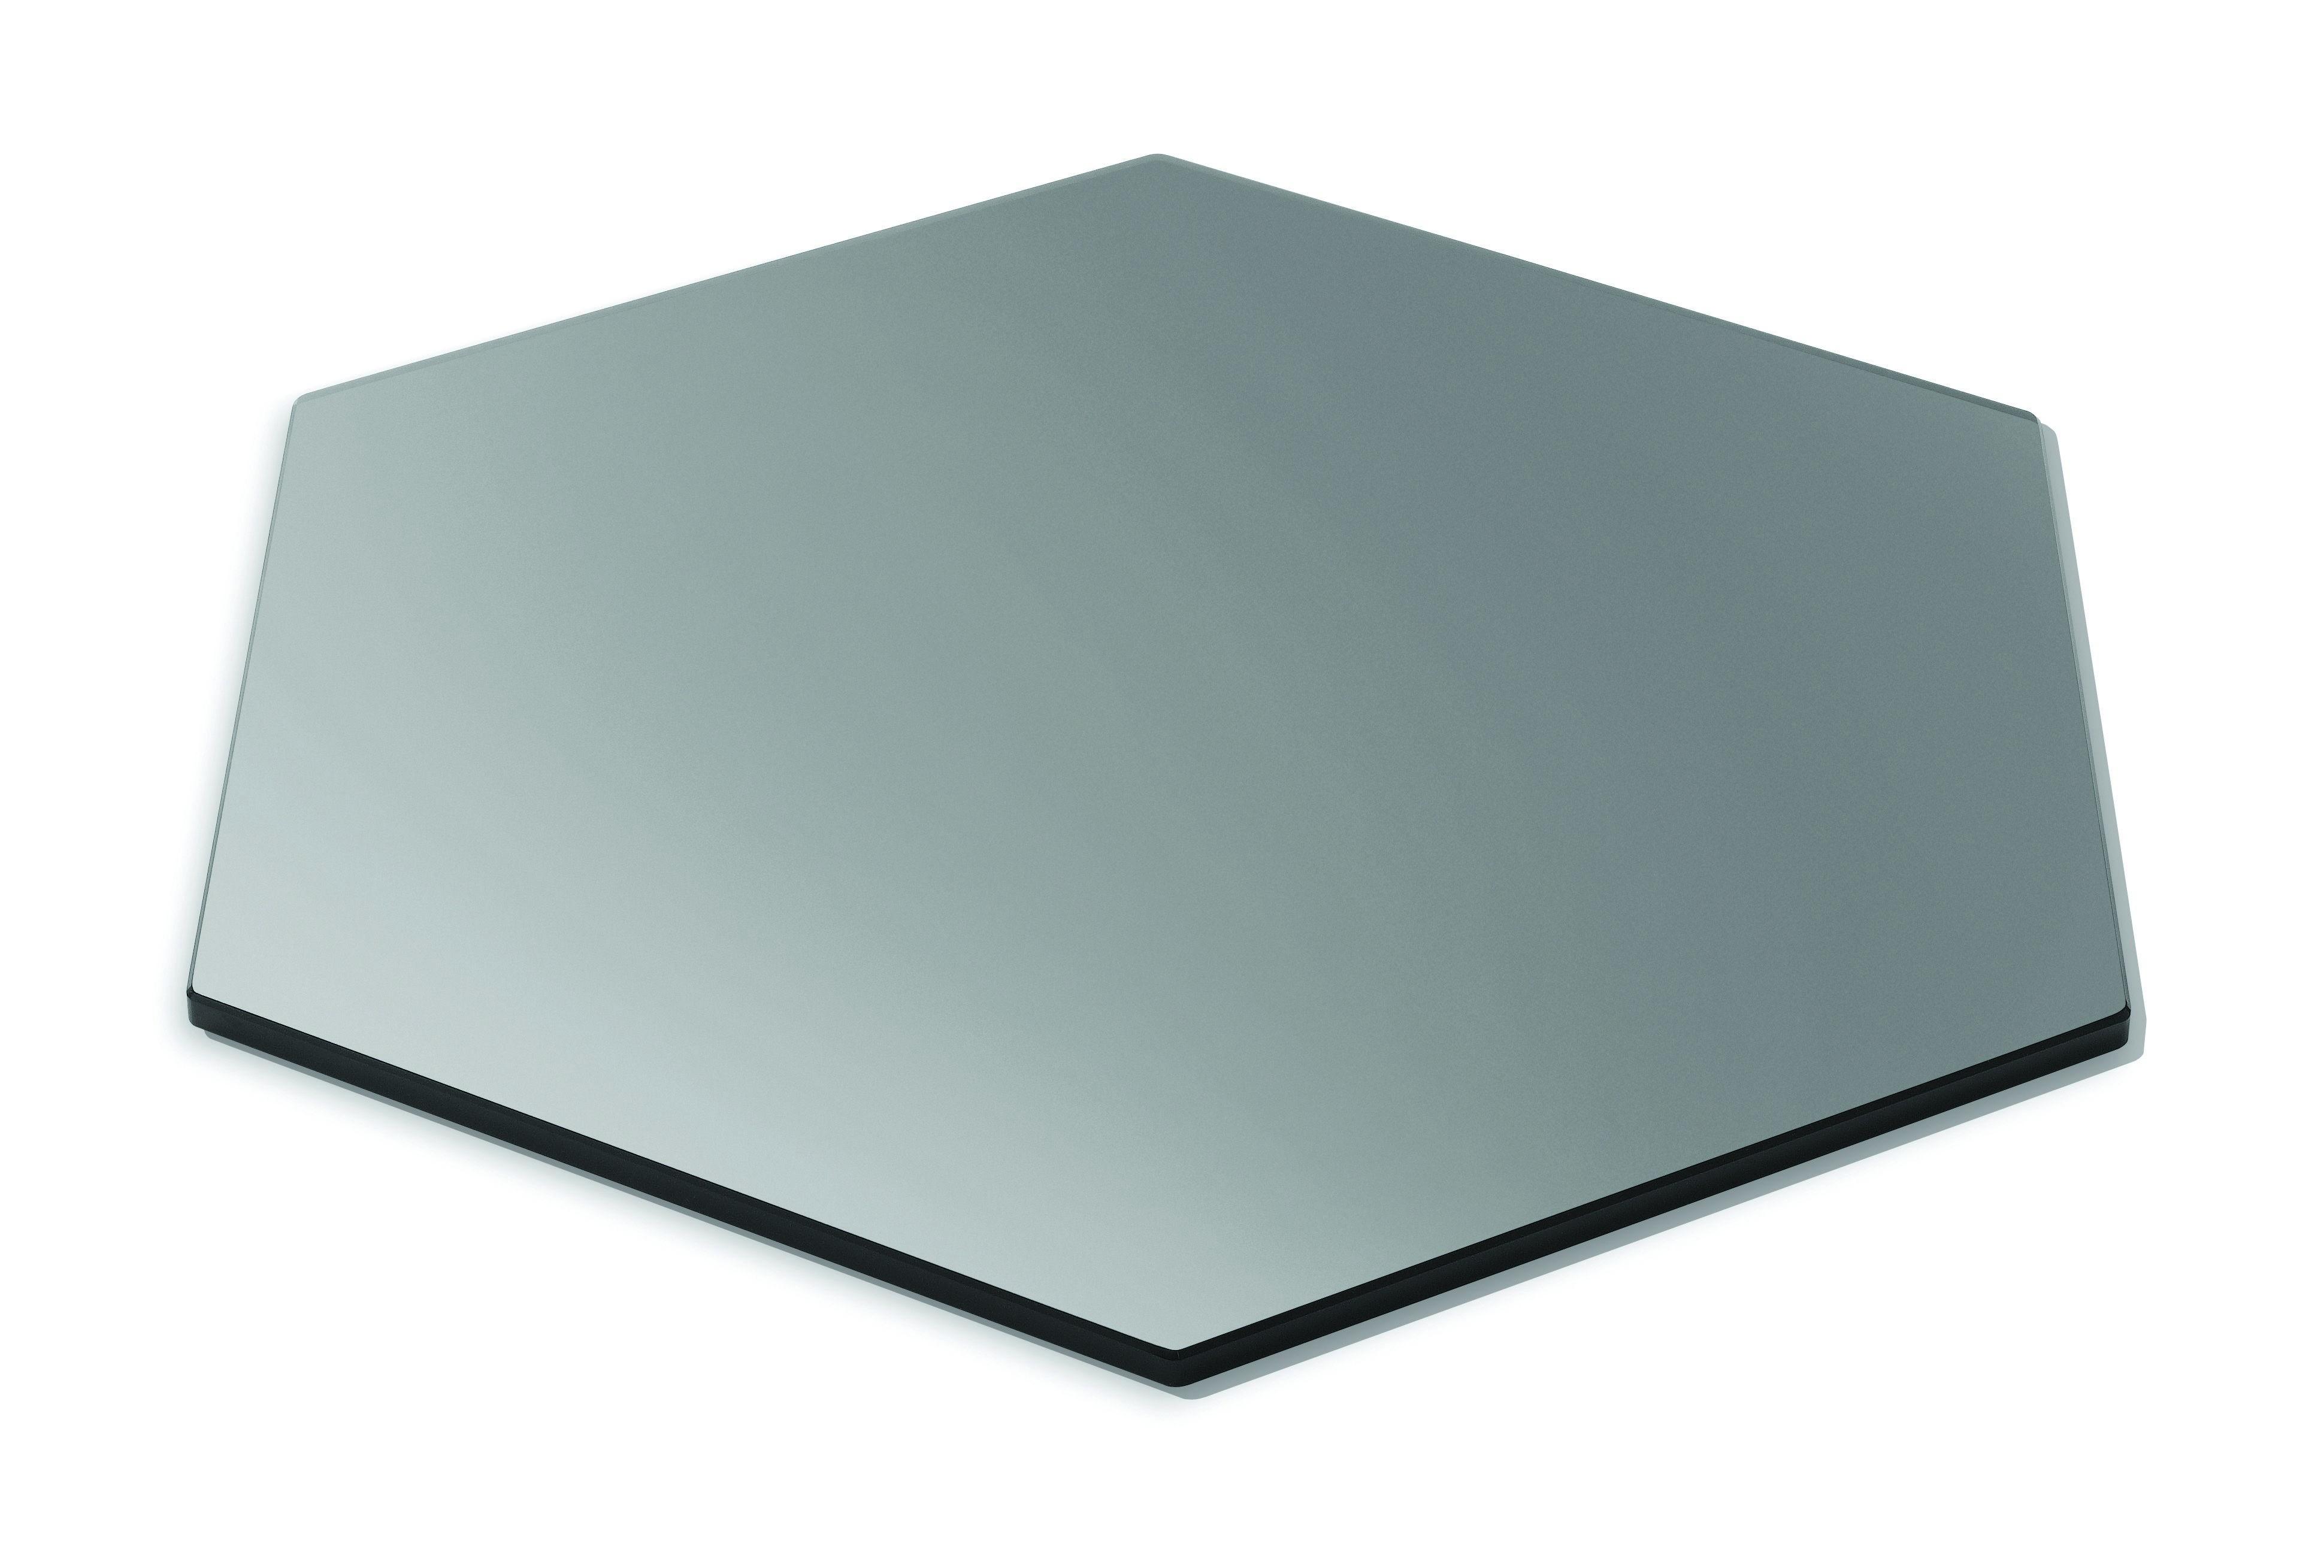 "Rosseto SG011 Honeycomb™ 19"" Large Black Tempered Glass Surface"